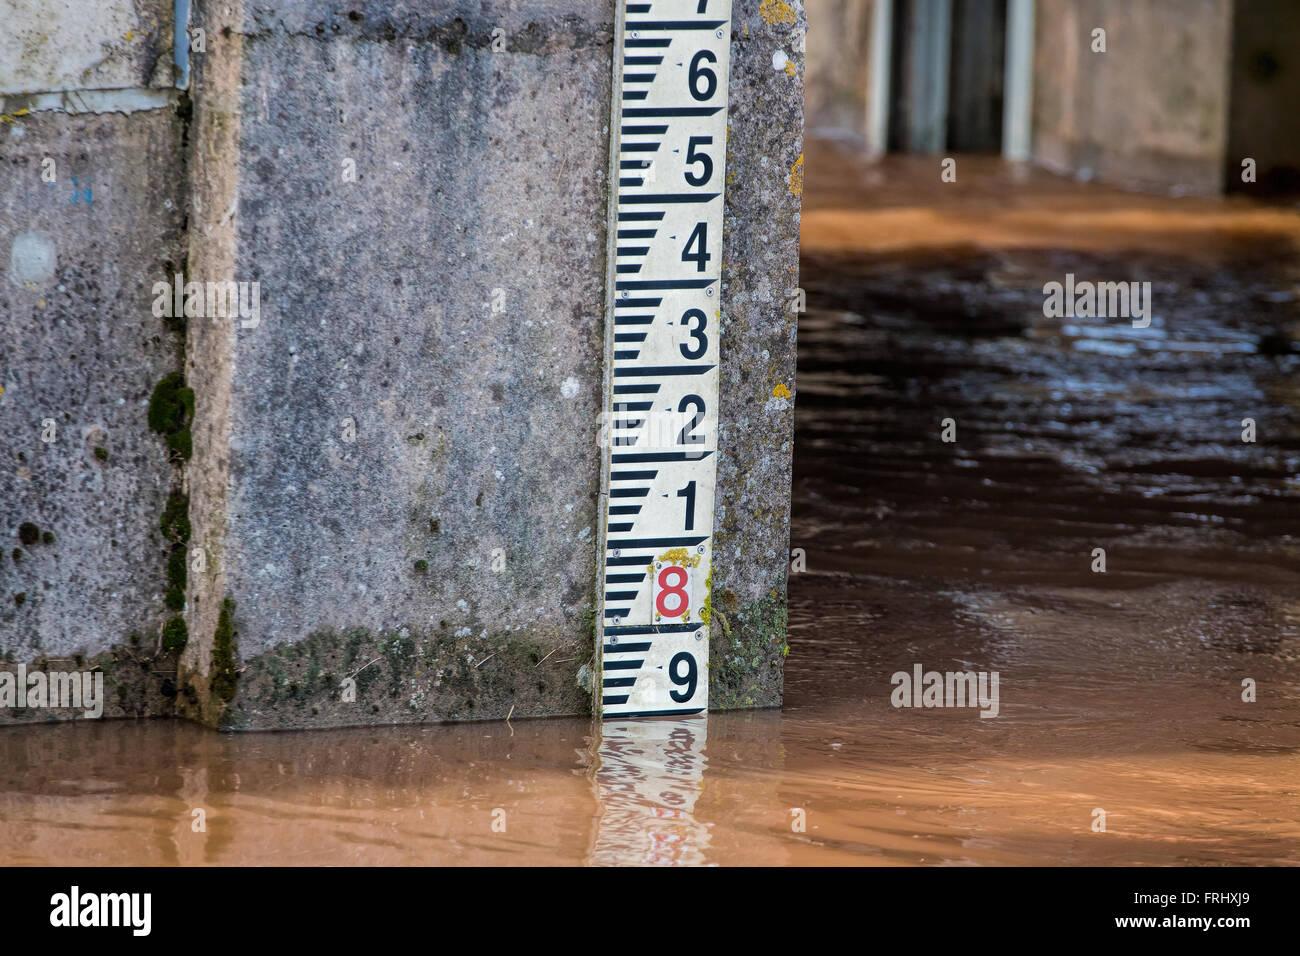 River Level Marker Gauge For Measurement. High River Levels Stock Photo